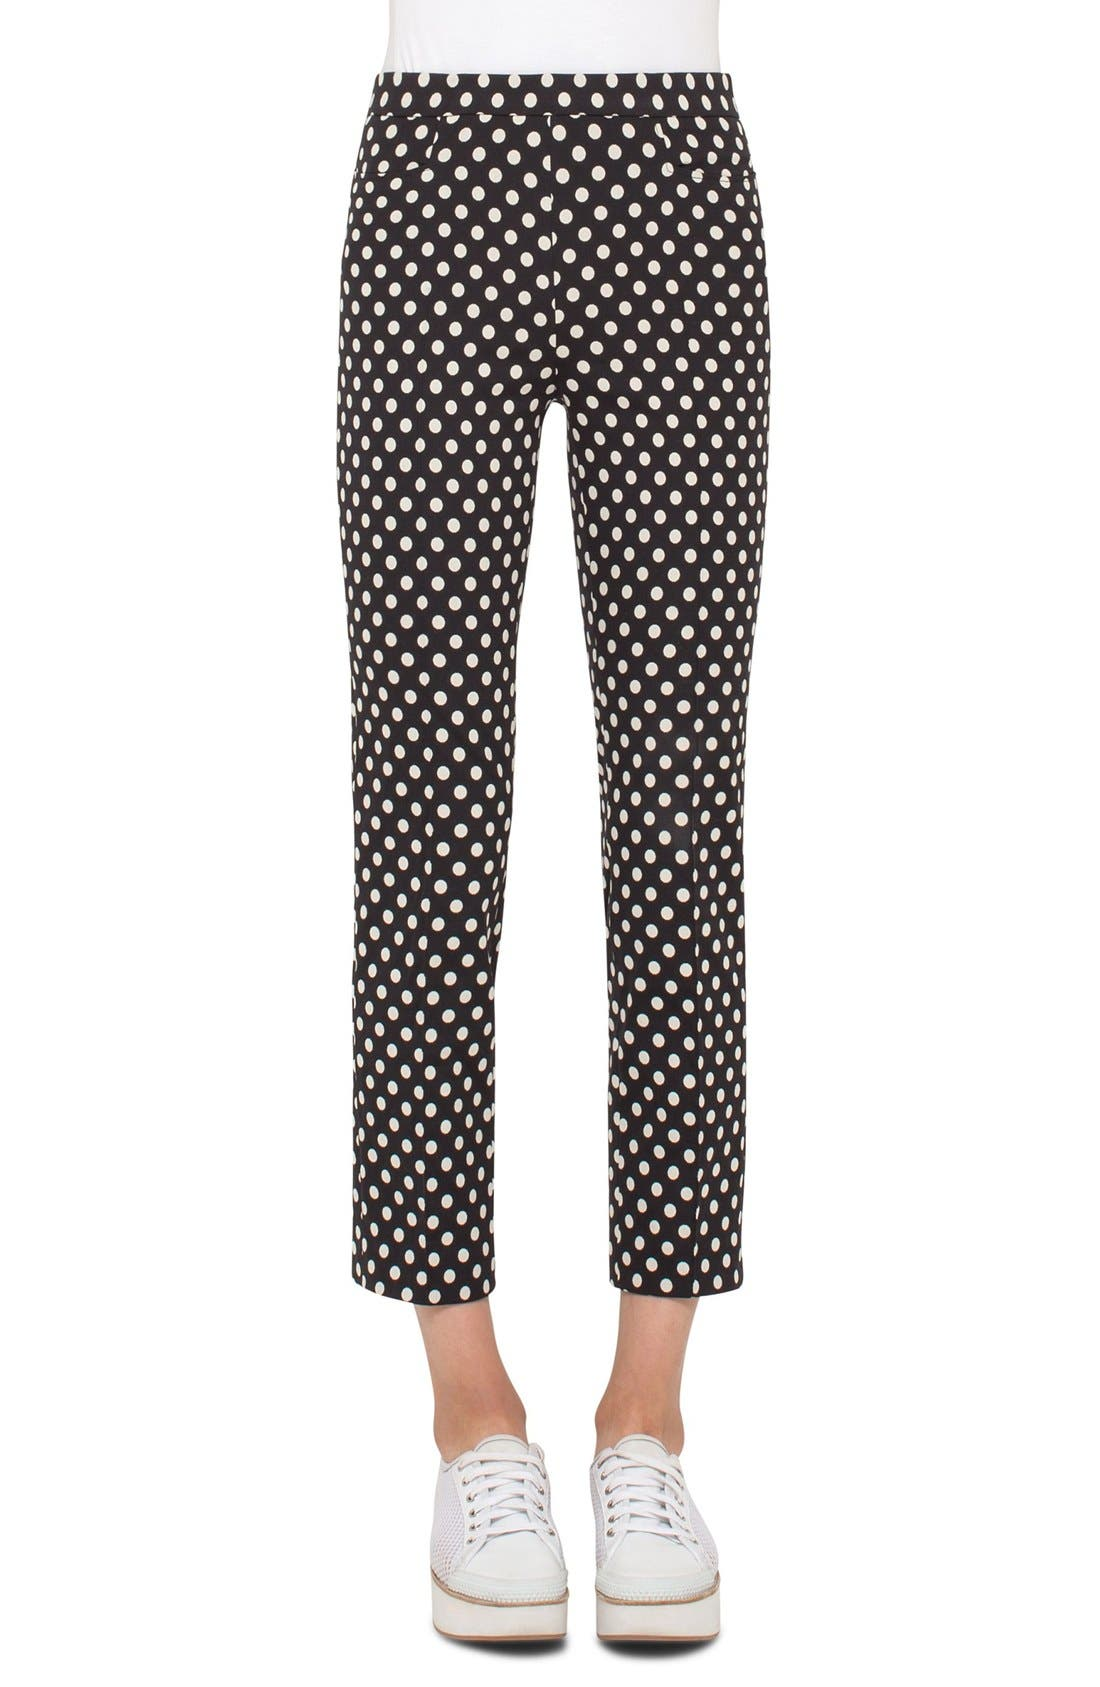 Franca Dot Print Techno Stretch Pants,                         Main,                         color, Dot Print Black